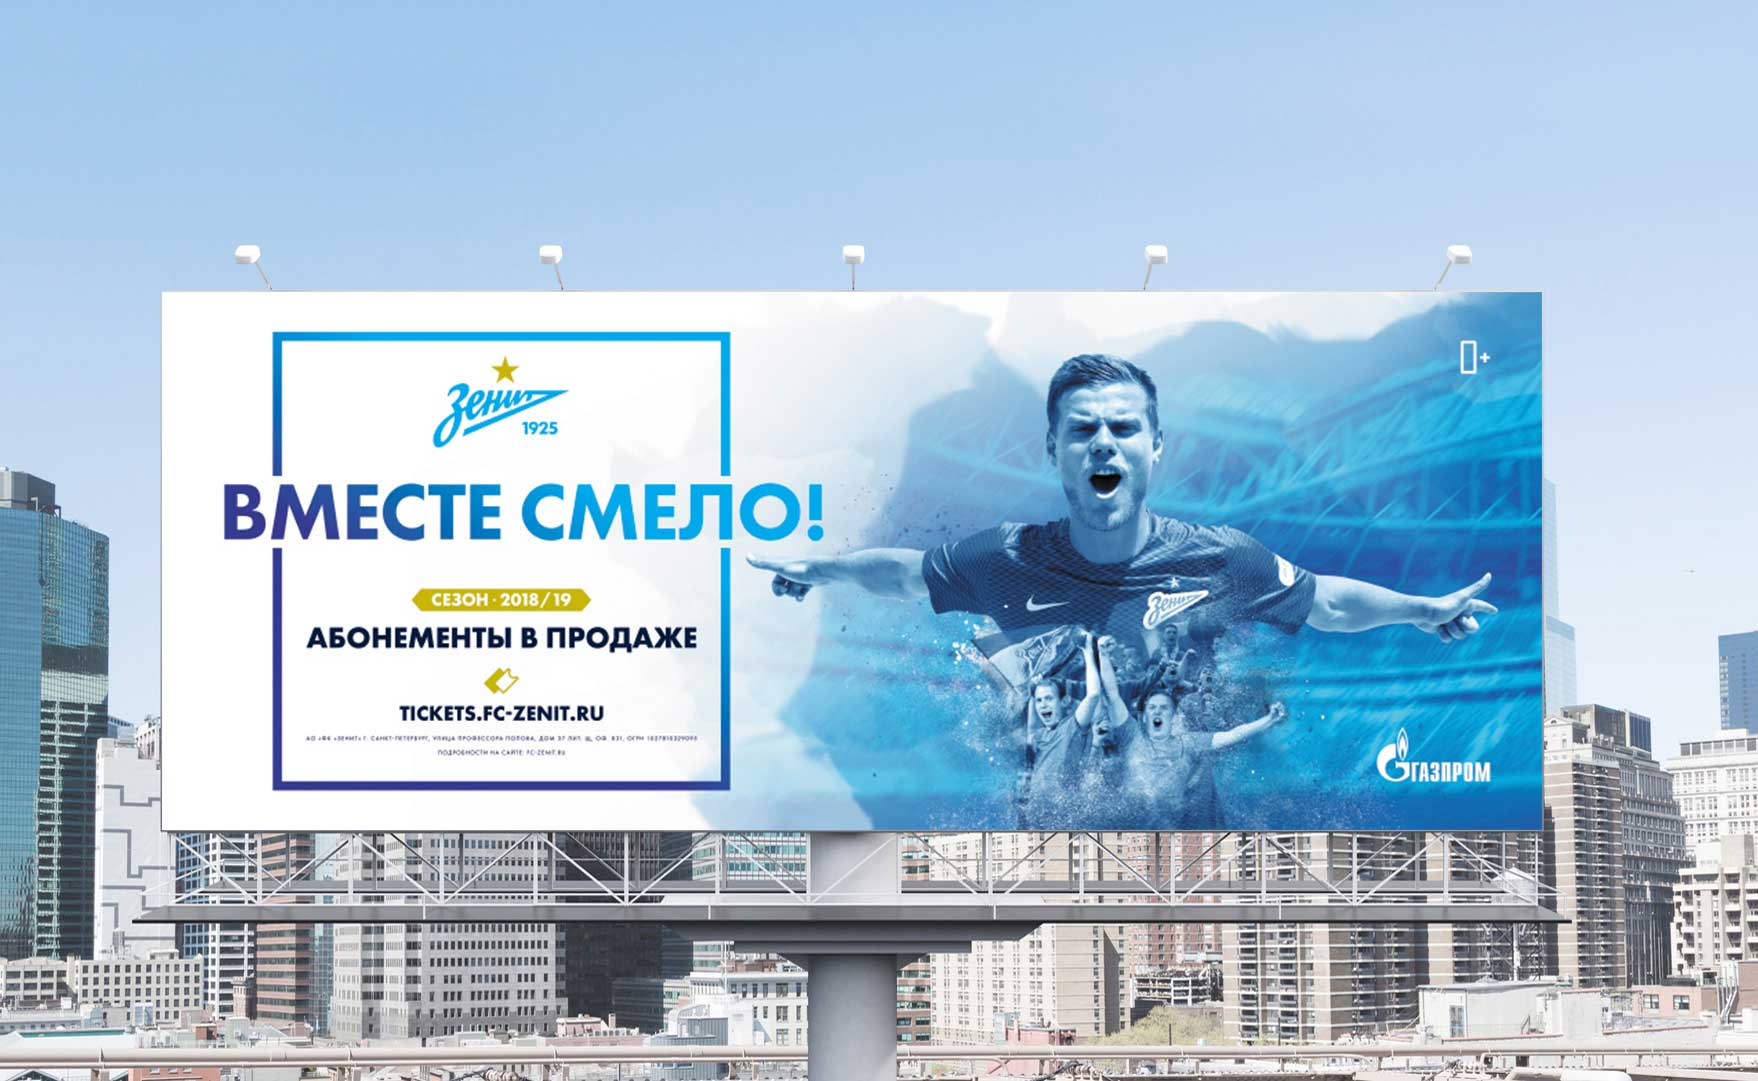 http://the-madmen.ru/wp-content/uploads/2019/Портфолио/Зенит/2442x949-Zenit-Metro-Kokorin-CMYK-1x1.jpg